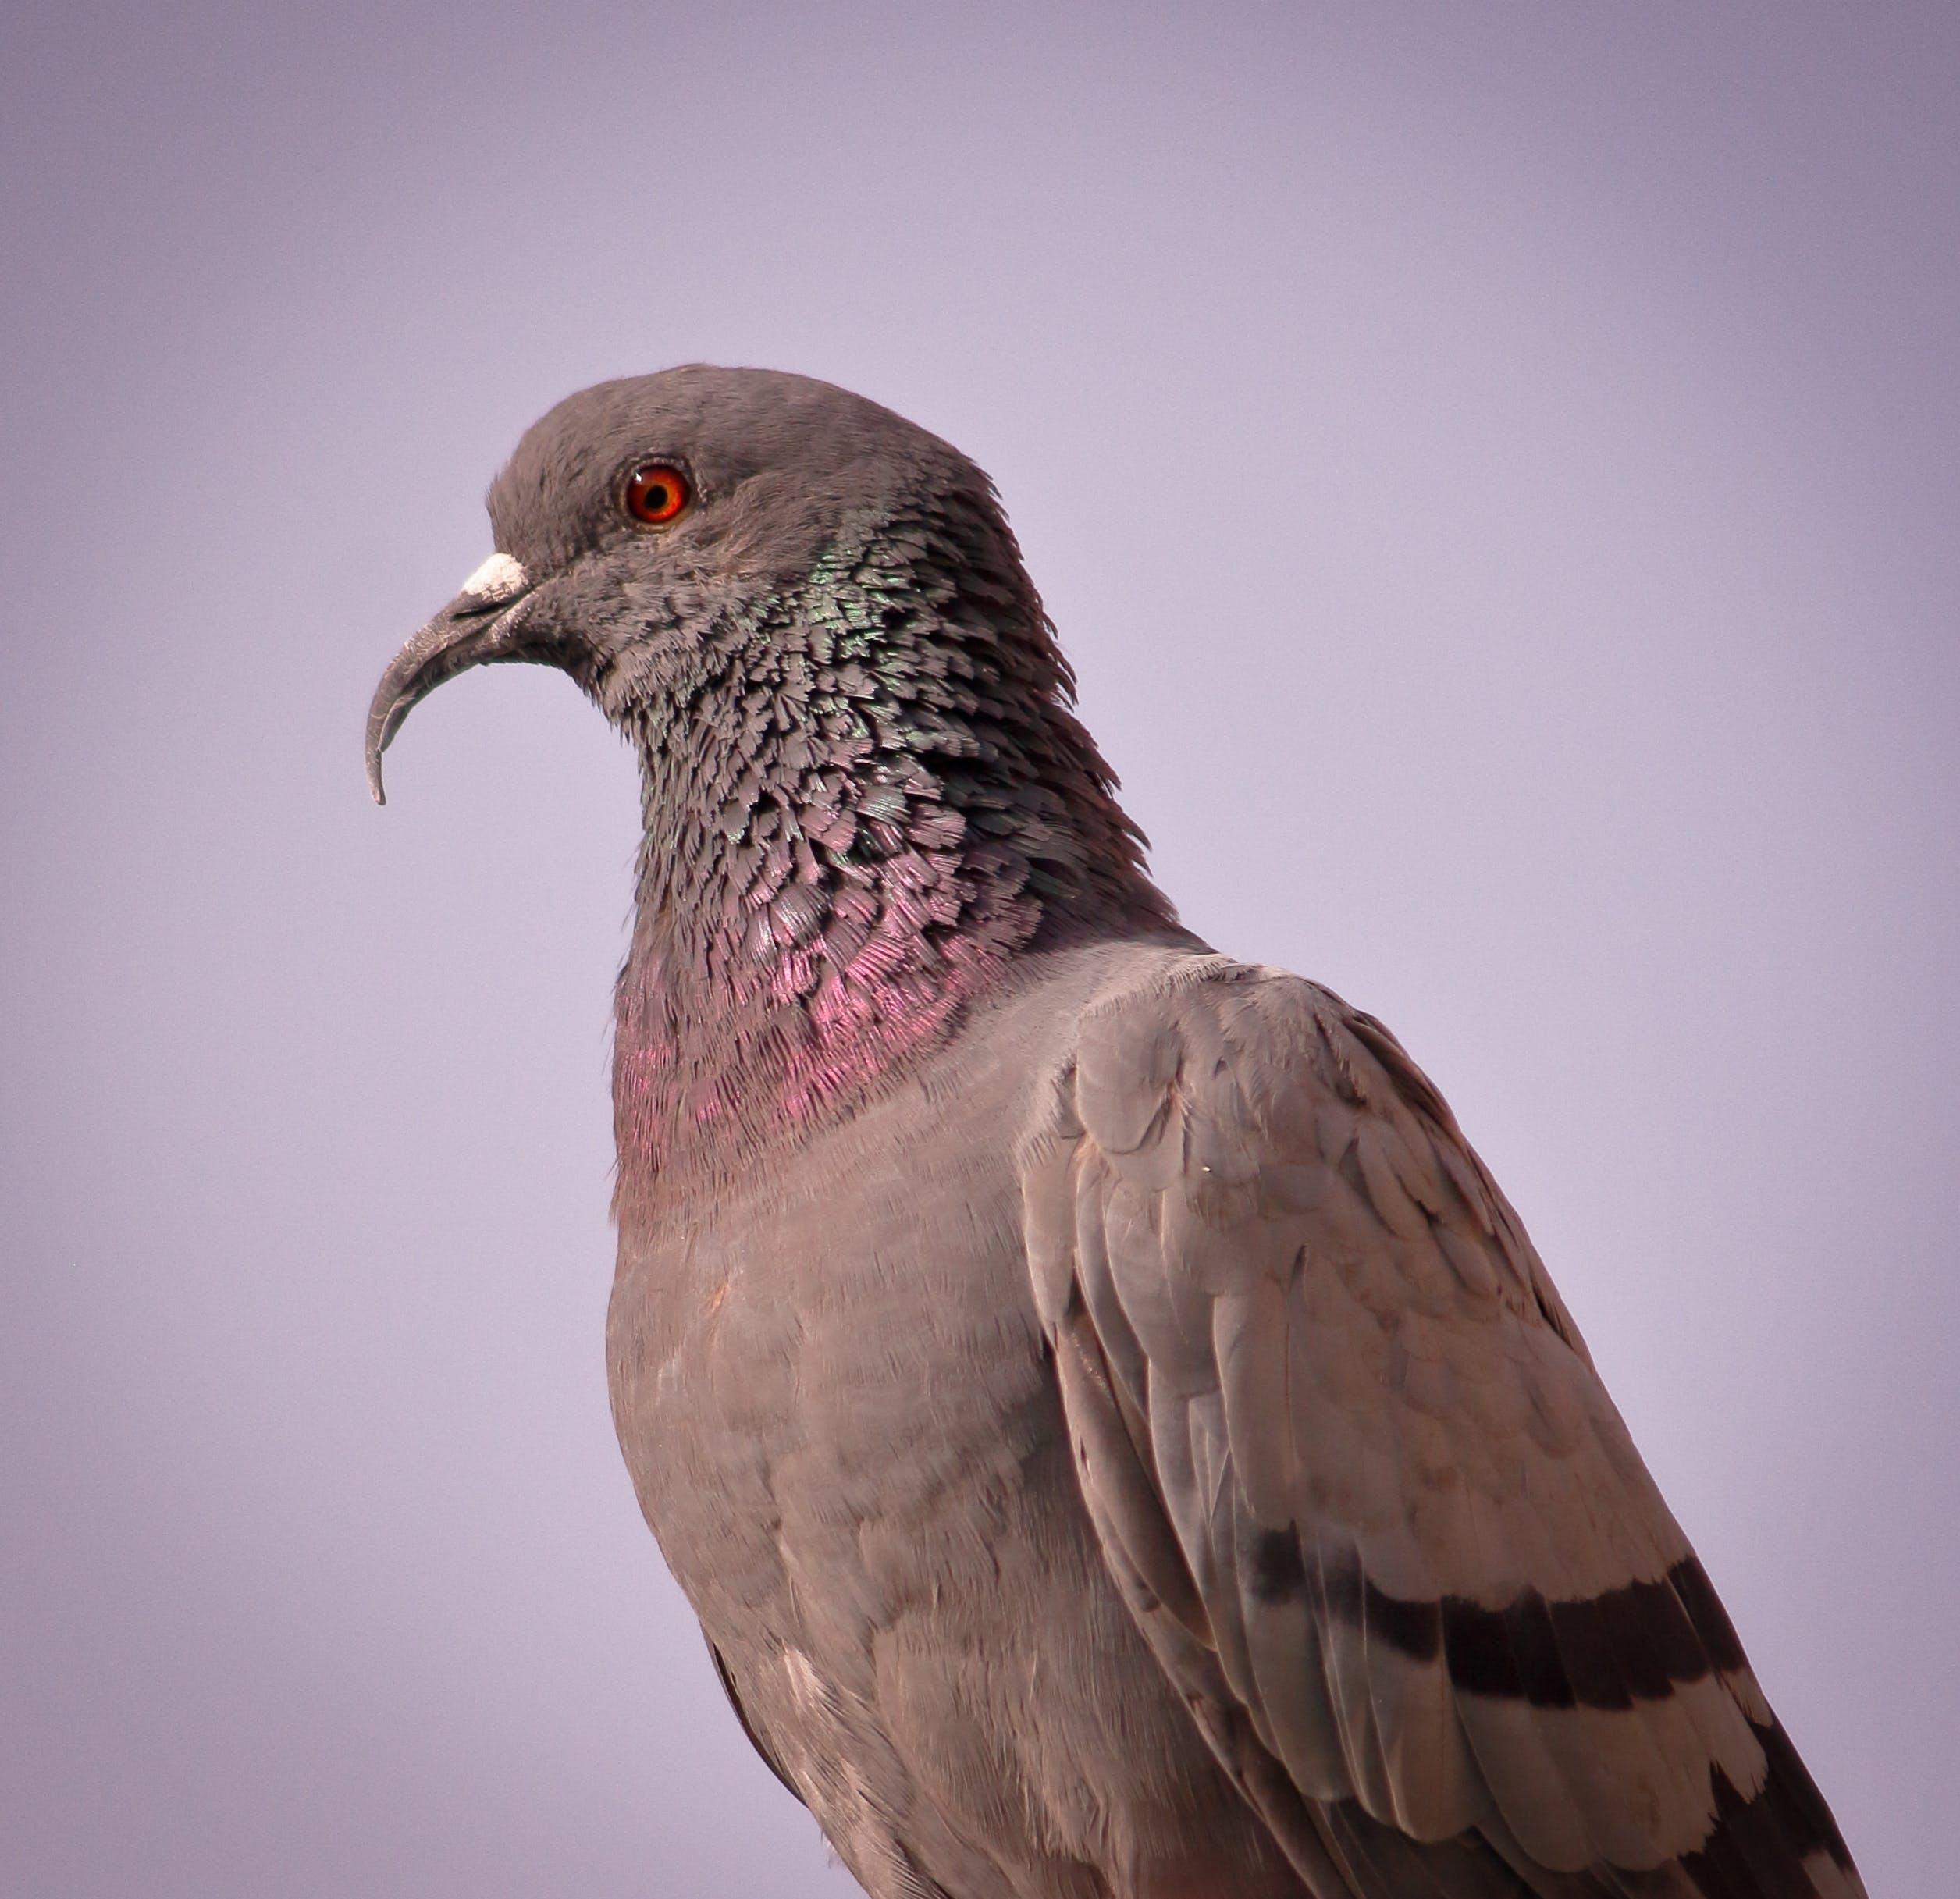 Gratis stockfoto met #photography #photooftheday #photographyislife #ph, #pigeonmurah #pigeonfeedingset #pigeonindonesia #p